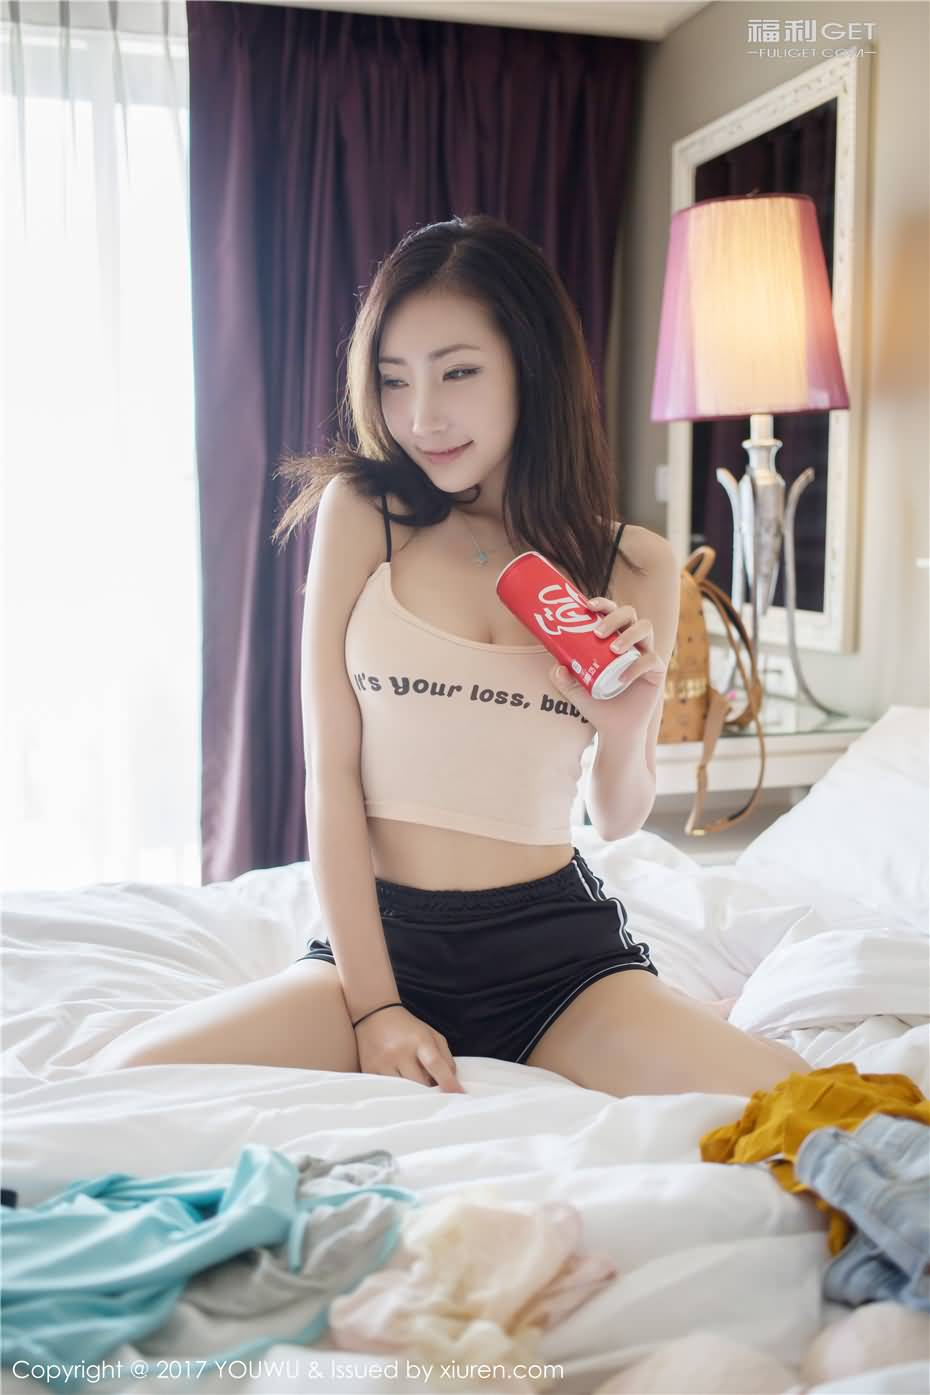 fuliget.com 2017 05 02 20 50 11 431 - [YouMi尤蜜荟] 2017-03-23 Vol.027 Yumi-尤美 [40P]